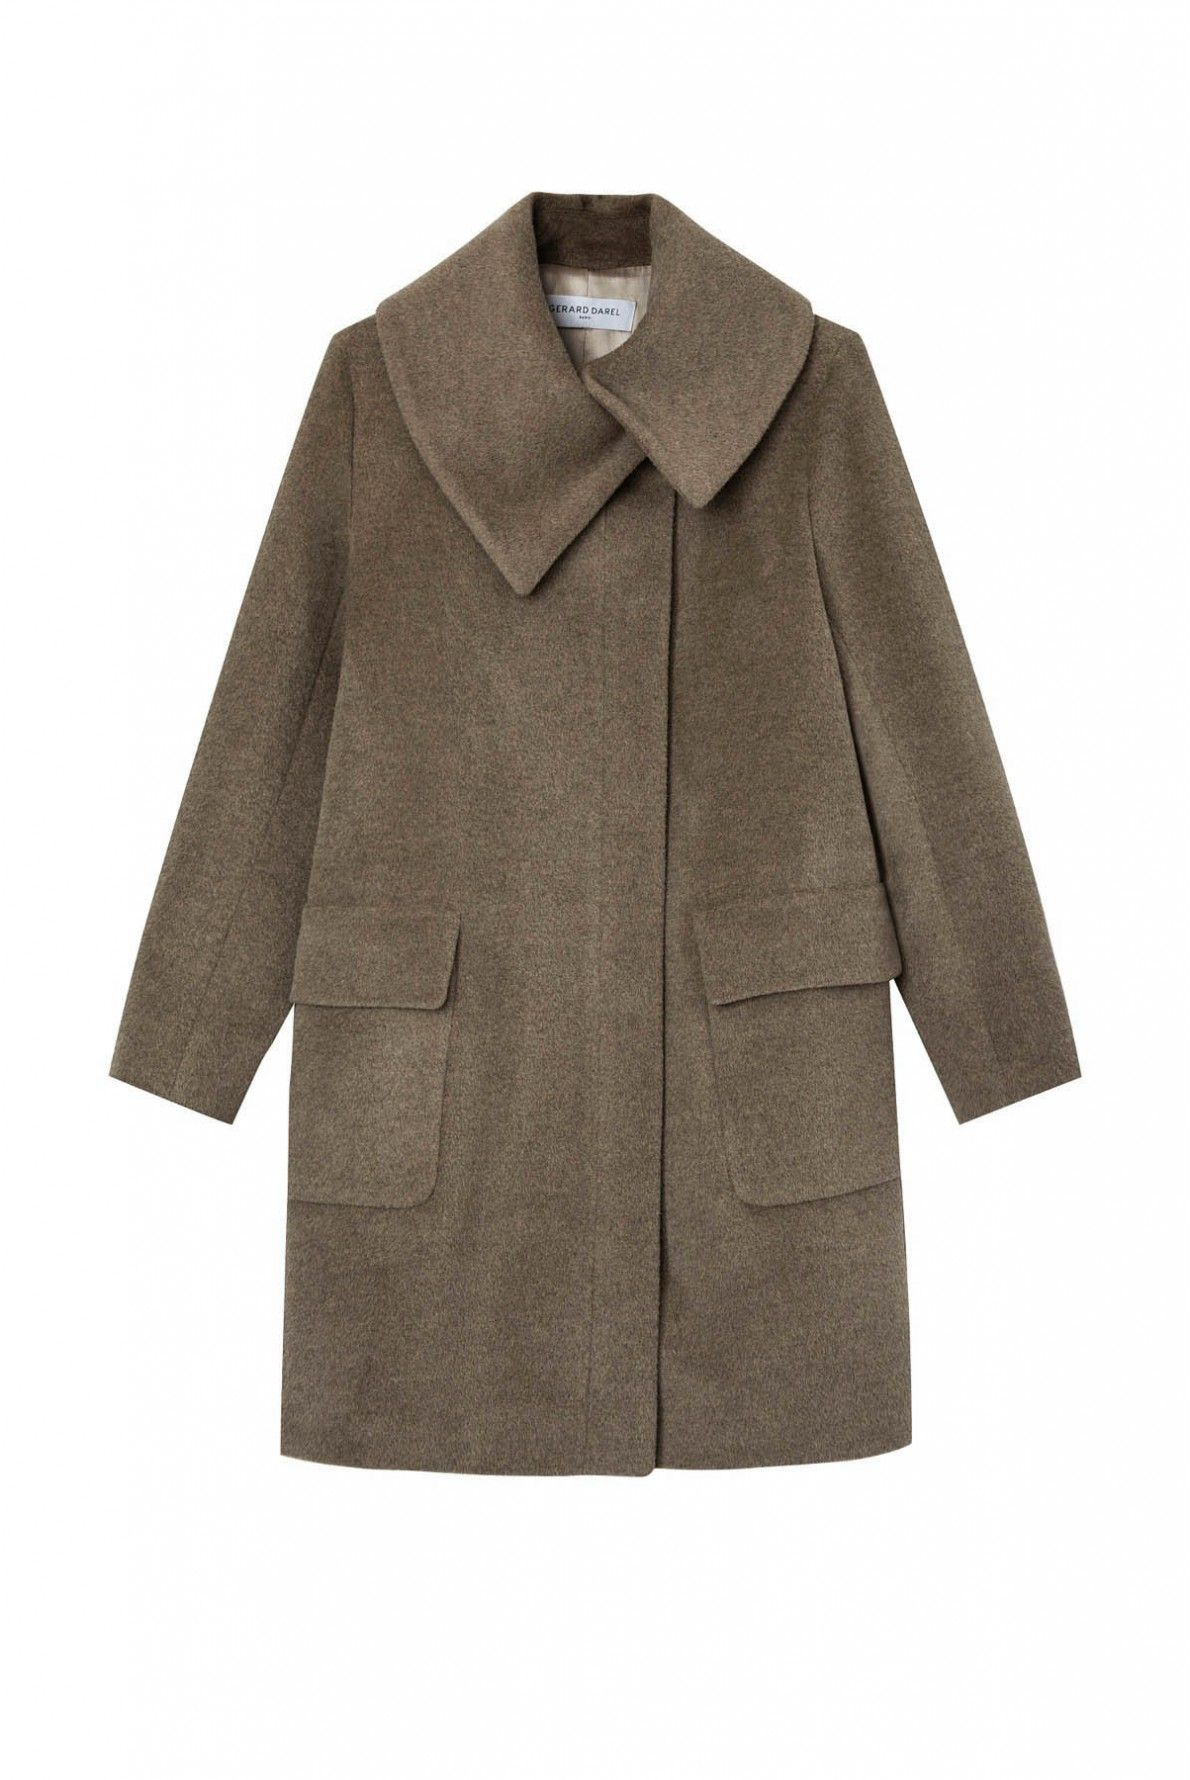 Gerard darel manteau beige